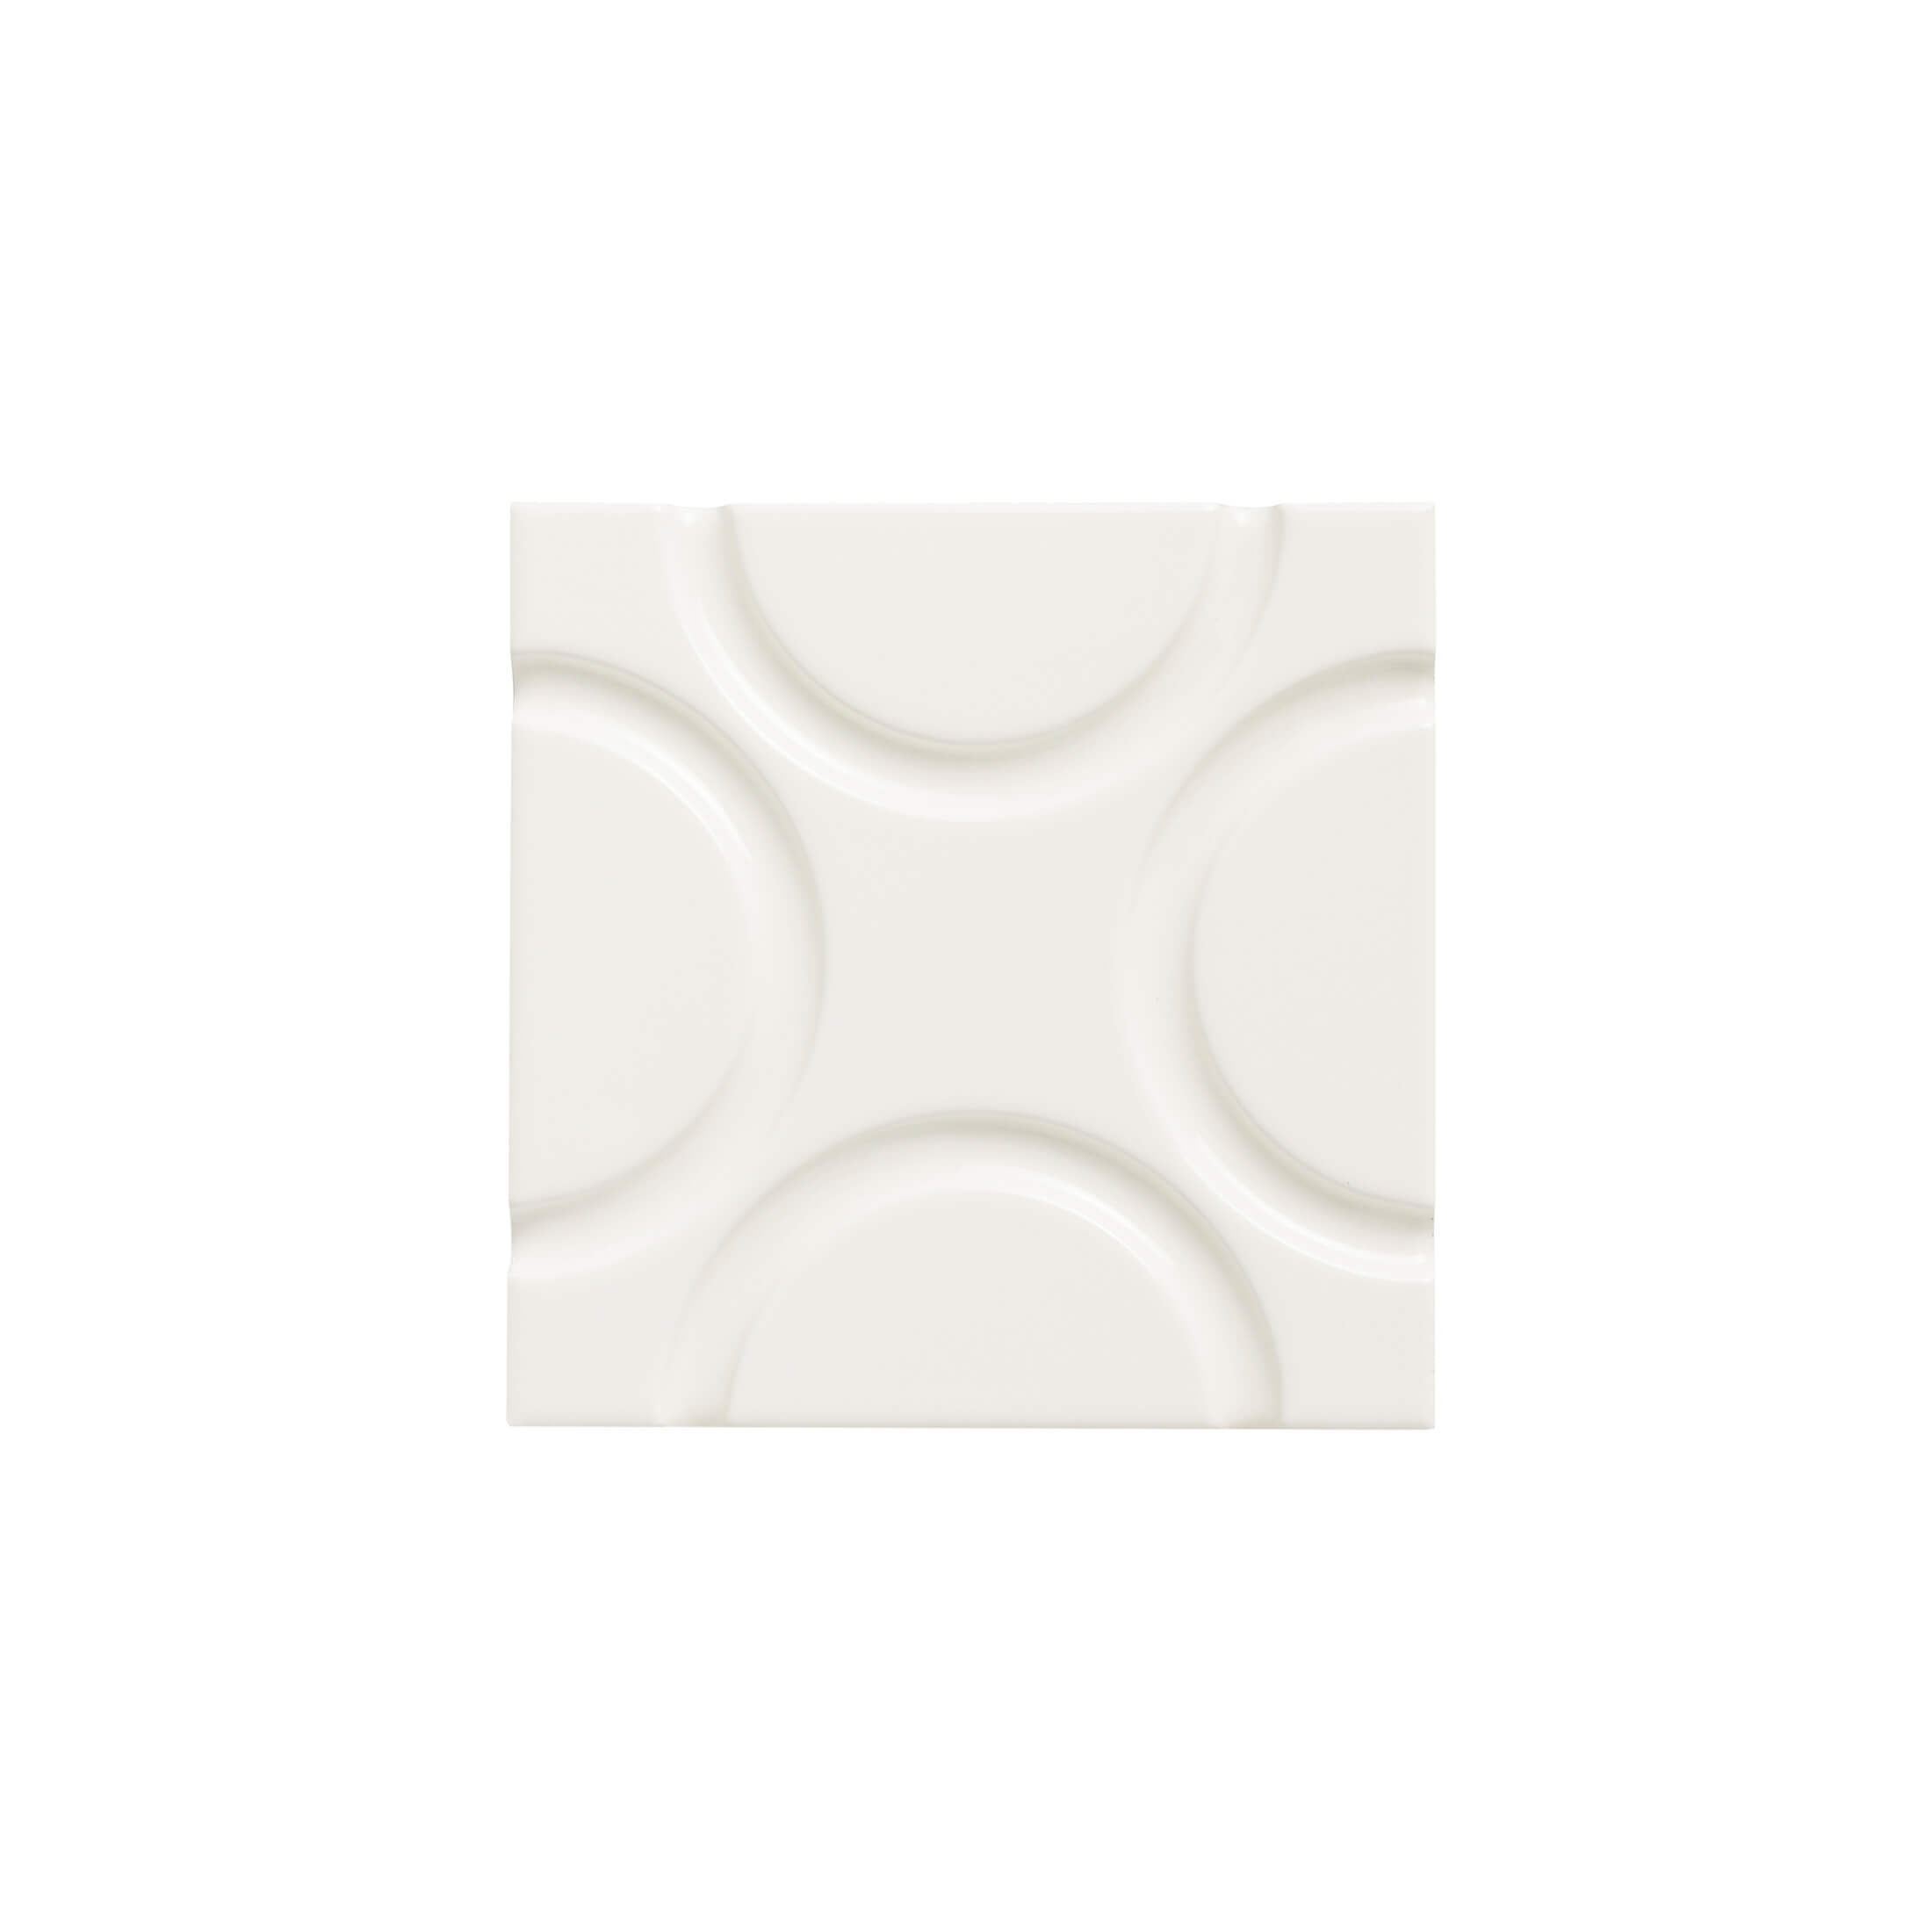 ADNE4129 - LISO GEO - 15 cm X 15 cm